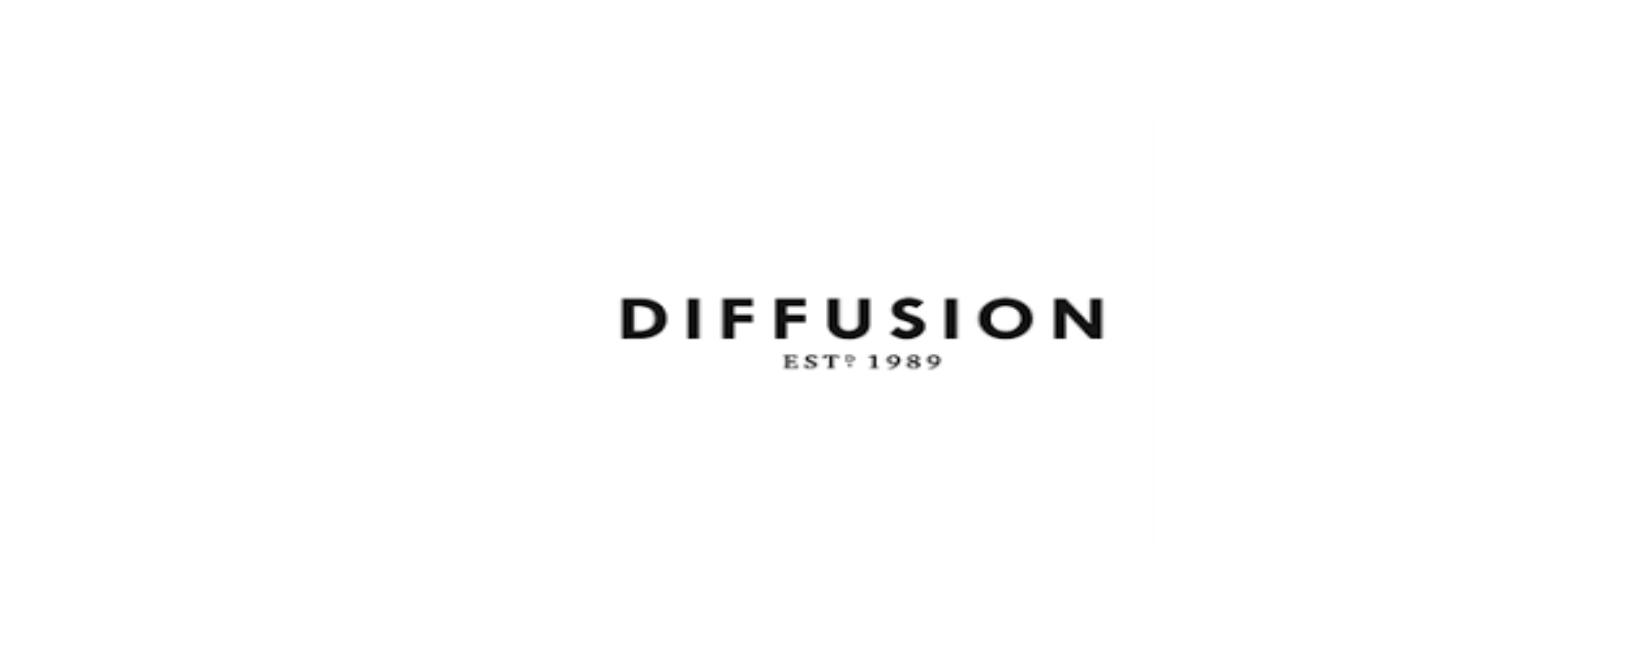 Diffusion UK Discount Code 2021